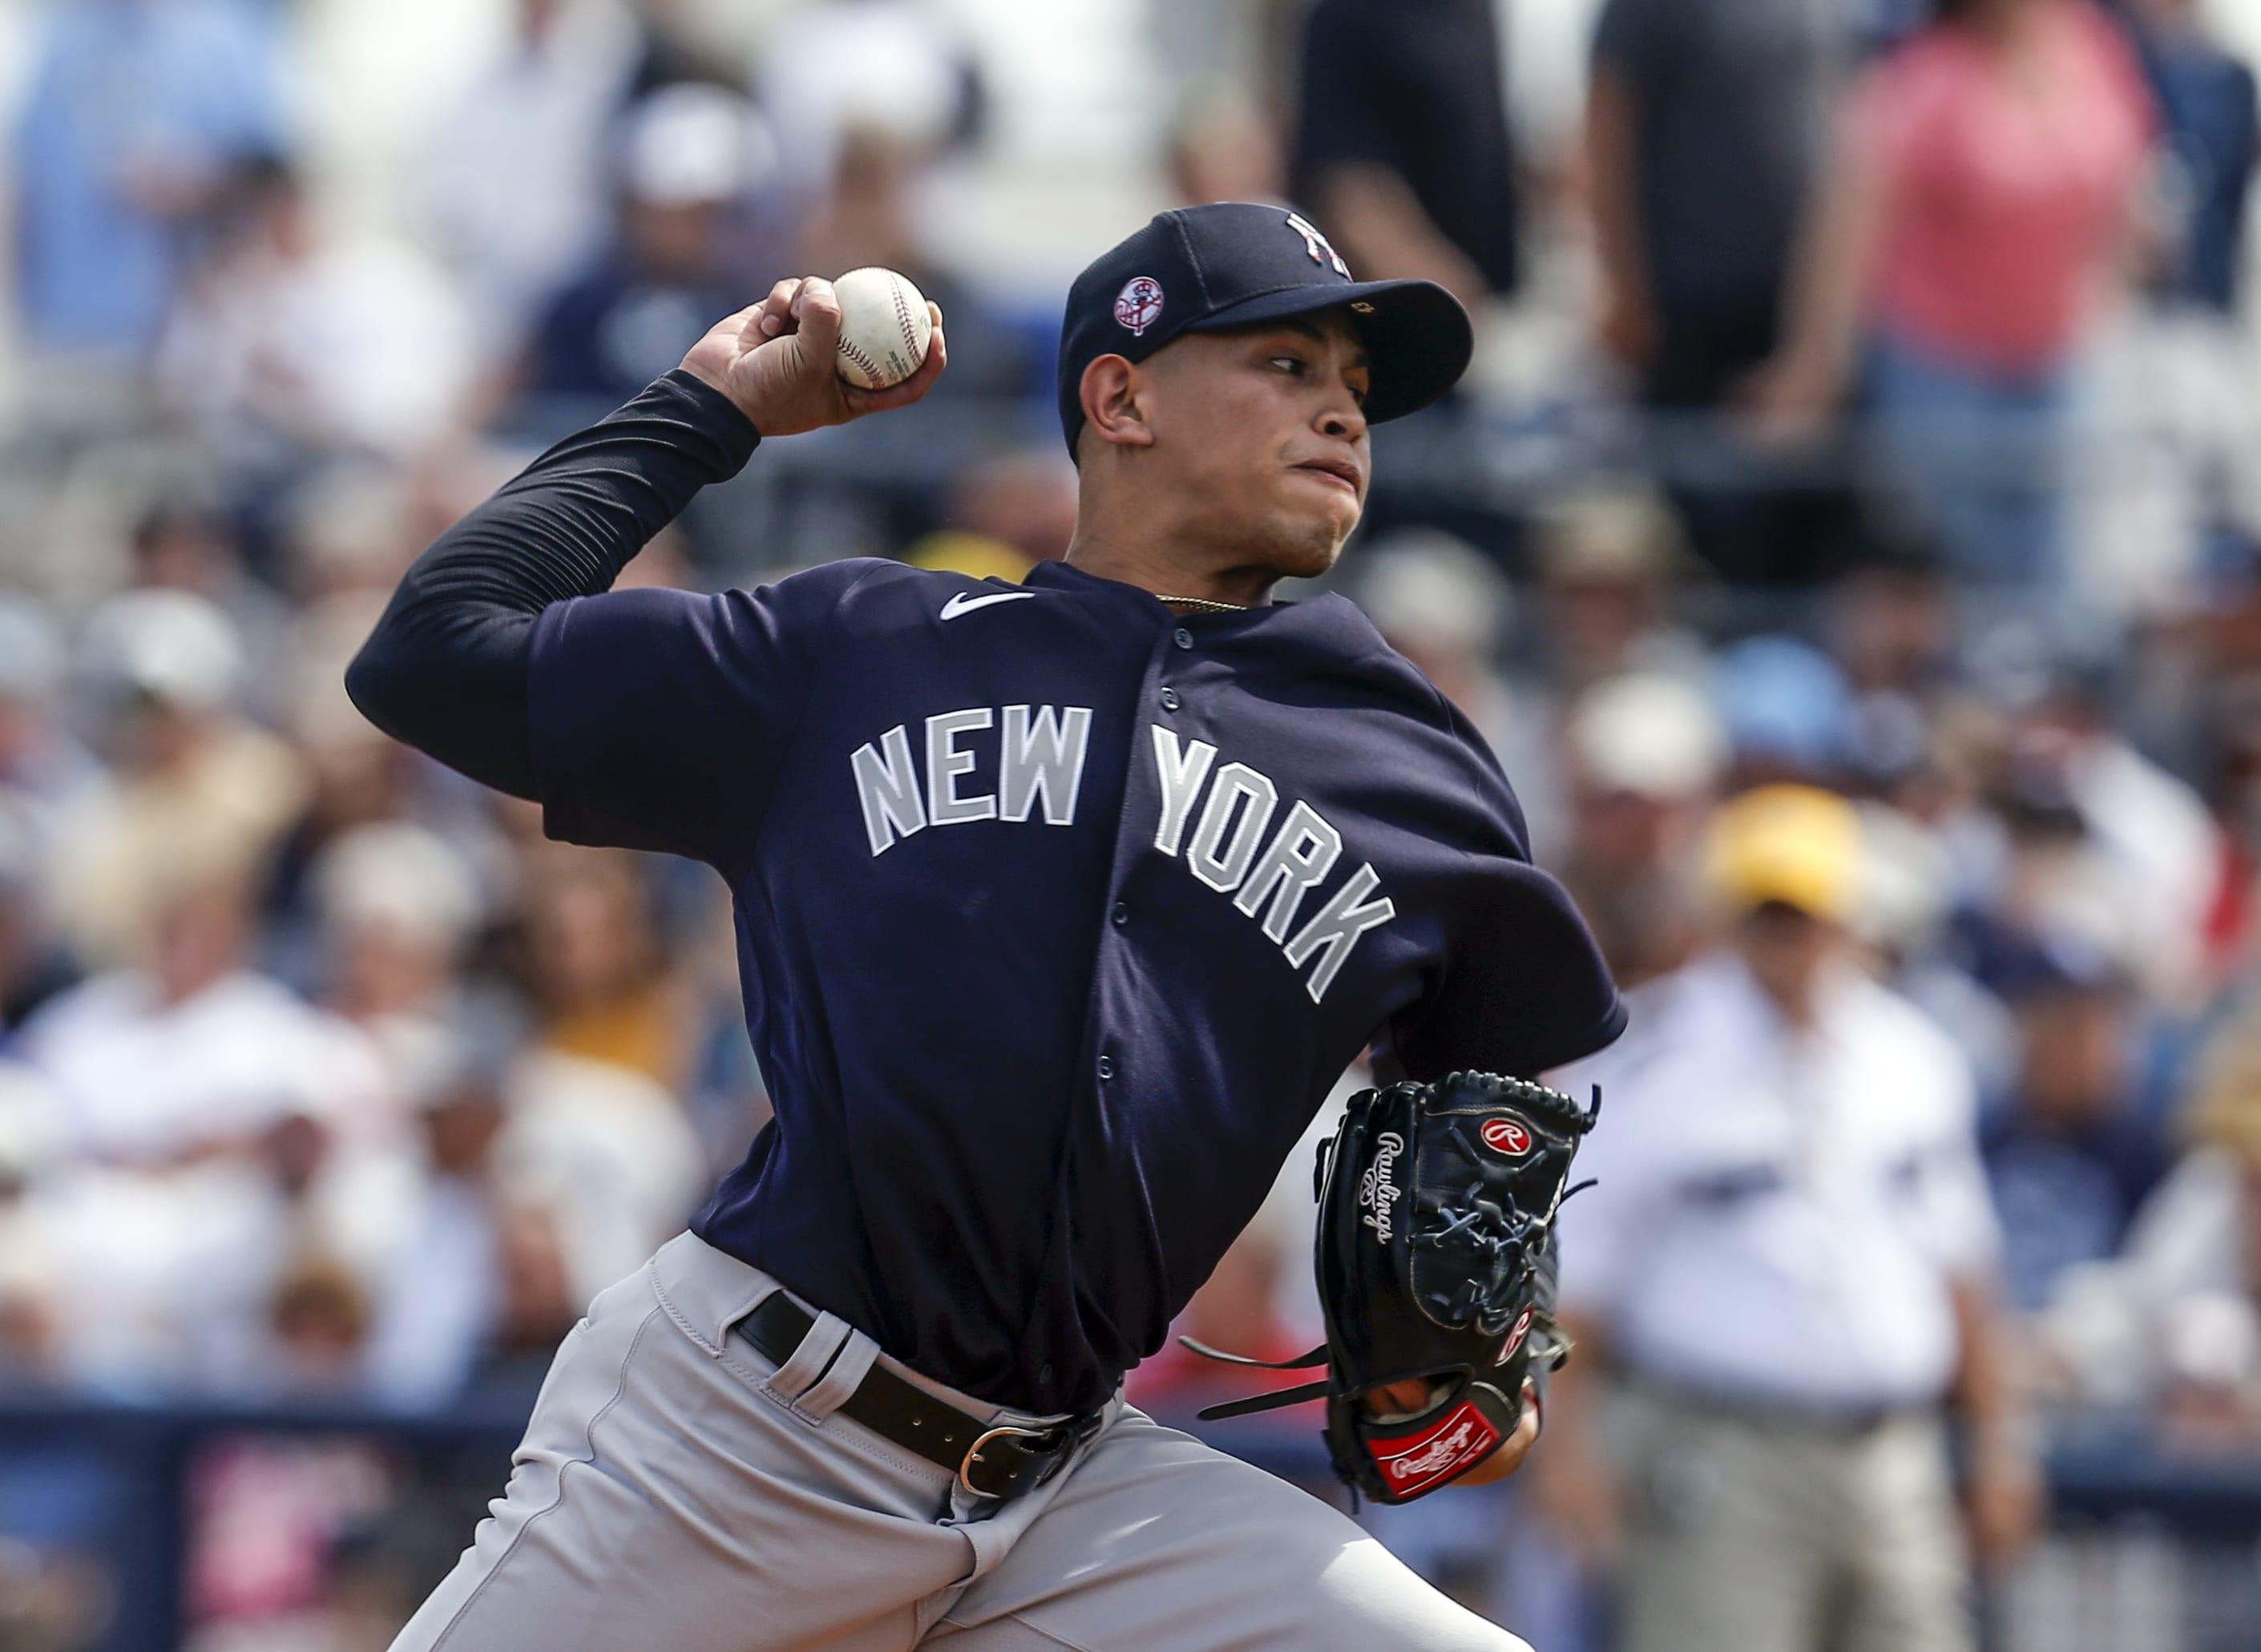 New York Yankees, Jonathan Loaisiga